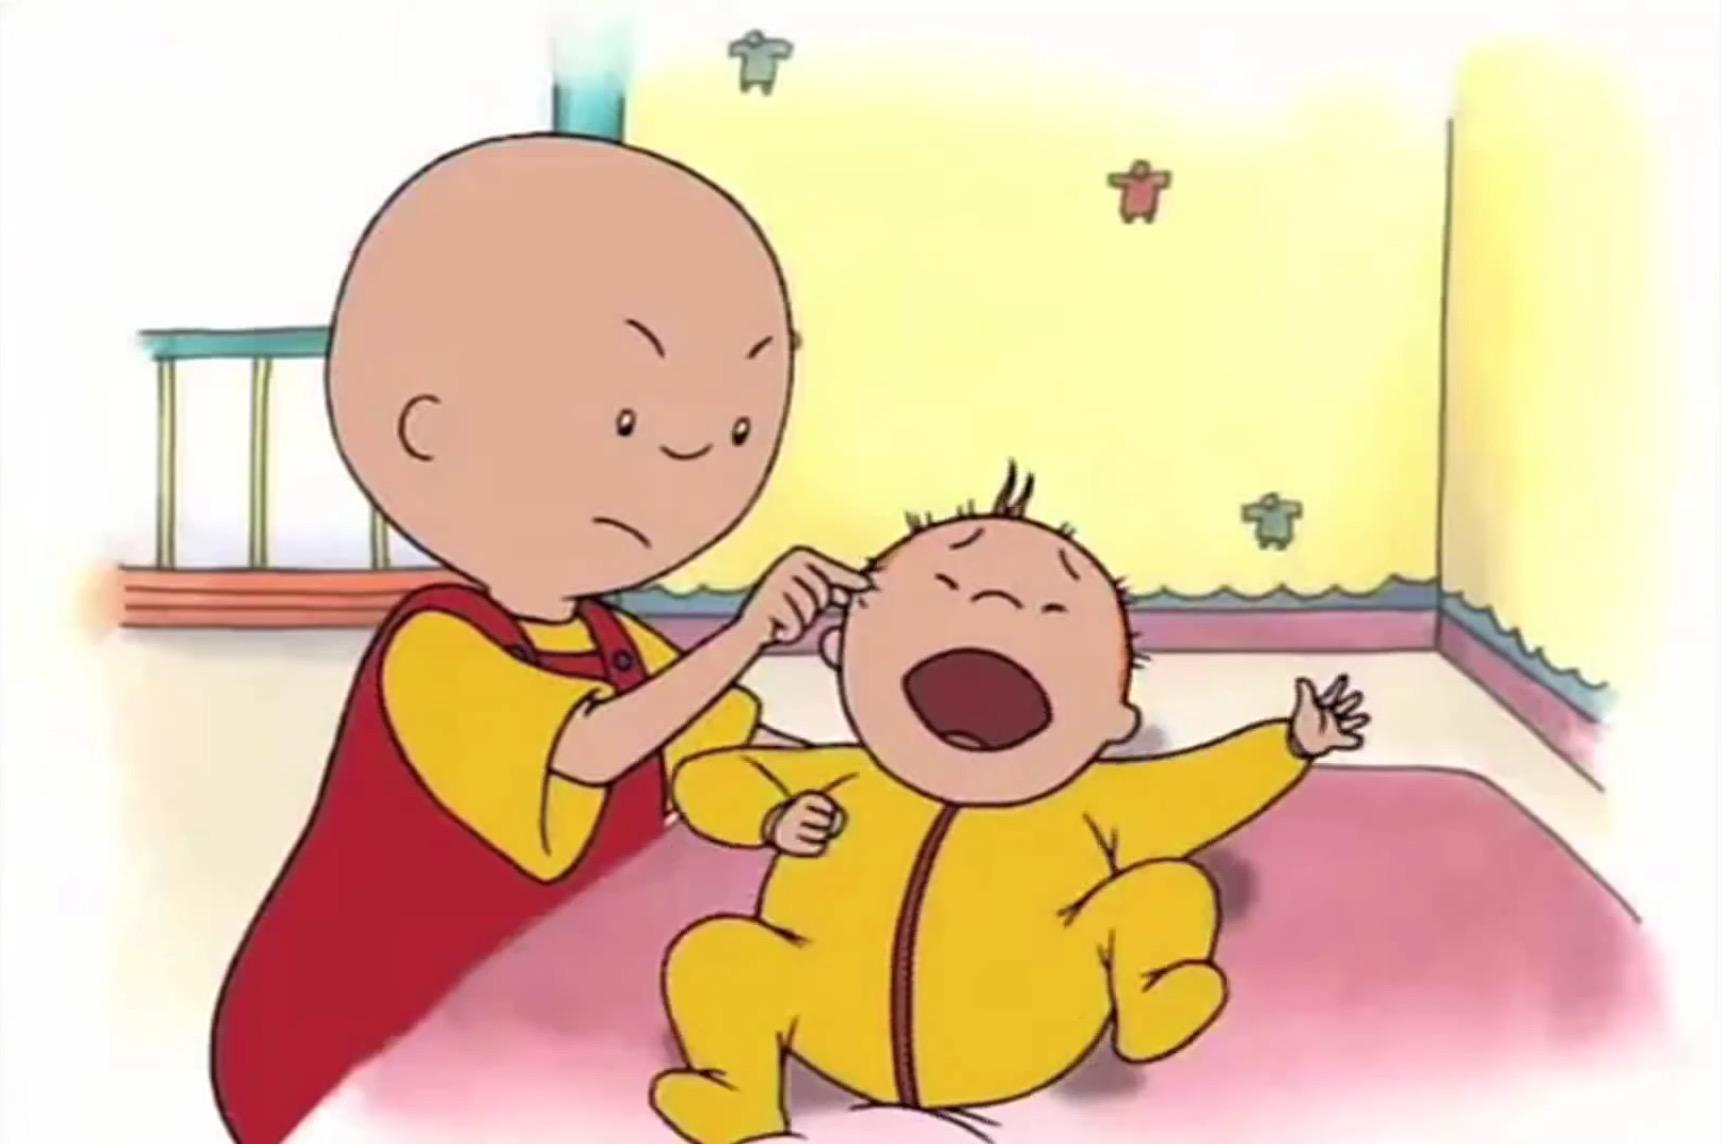 Cartoon Bald Kid With Little Sister